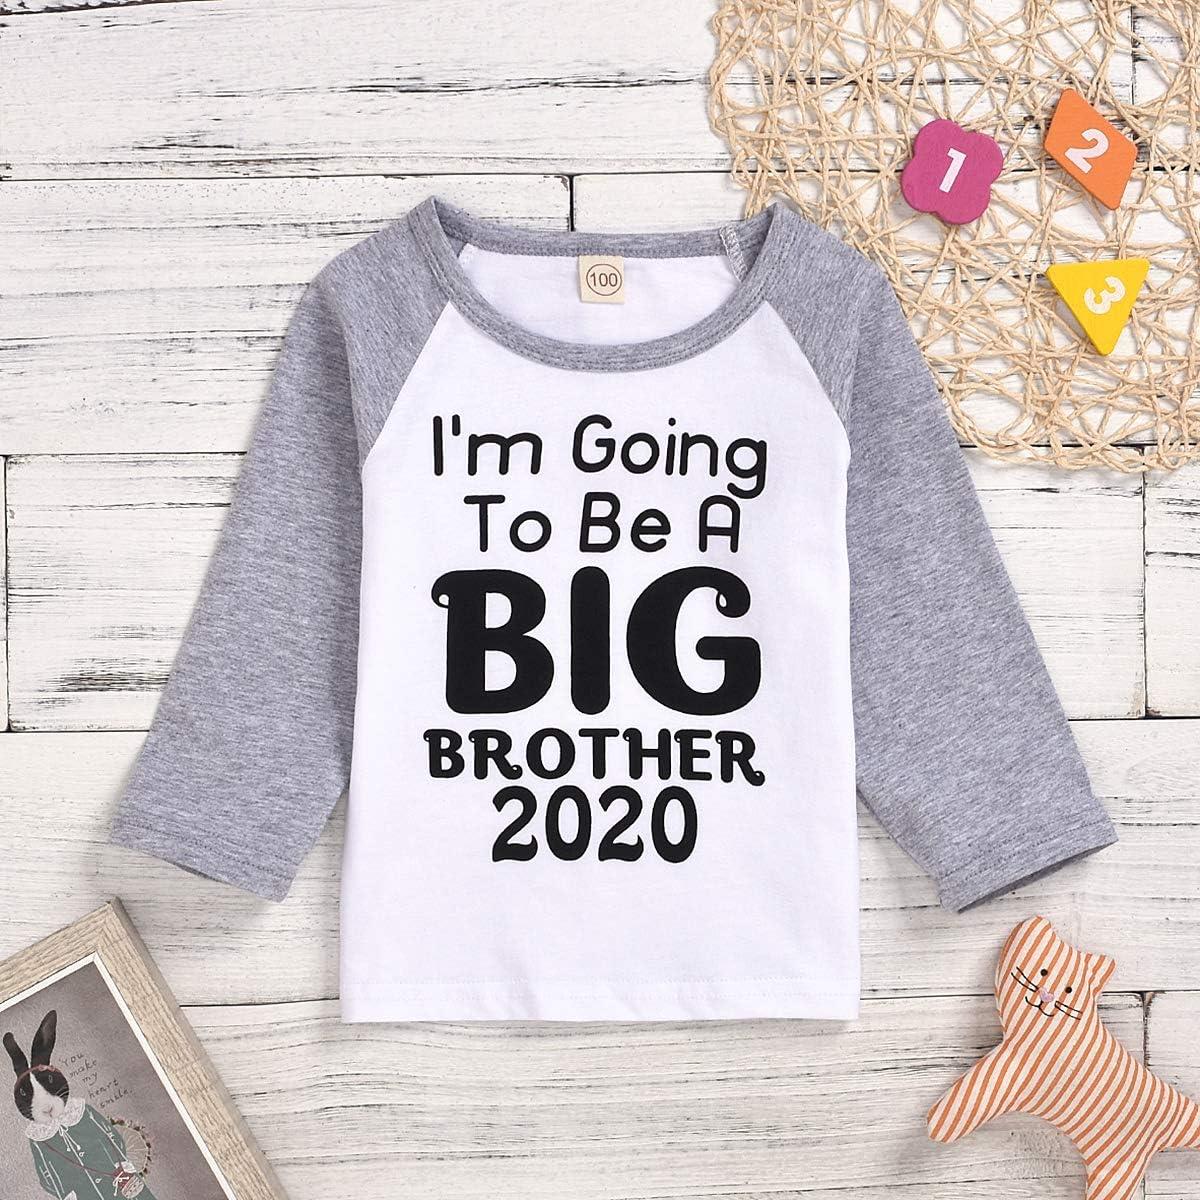 2020 Big Brother Big Sister Baby Jungen M/ädchen Langarm Gro/ße Schwester//Gro/ßer Bruder 2020 Letters Print Raglan Shirt Top